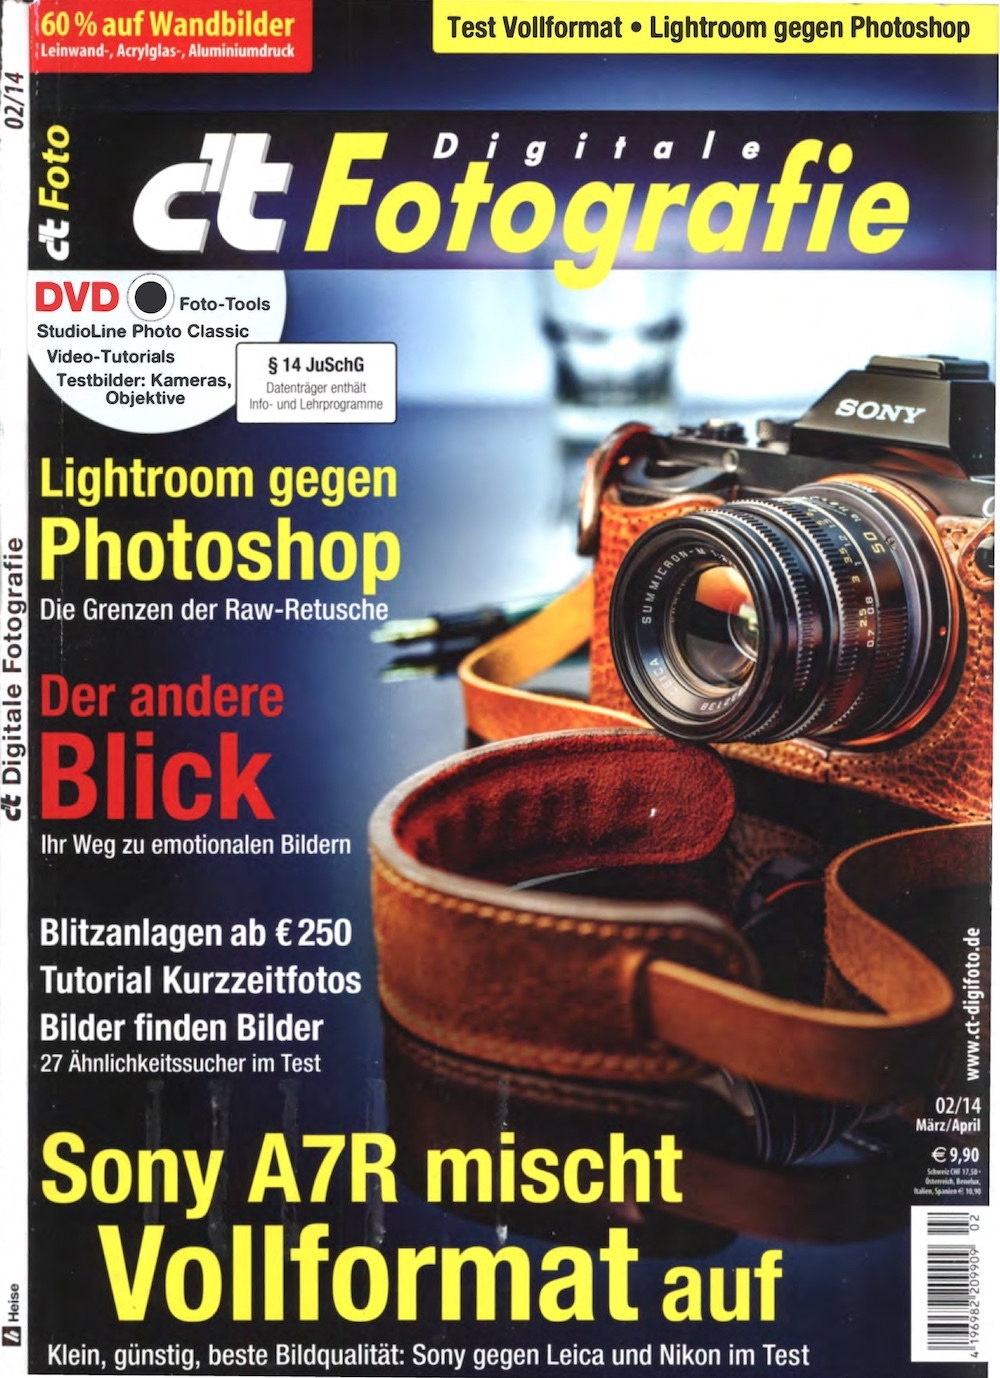 c't Digitale Fotografie 2014-02